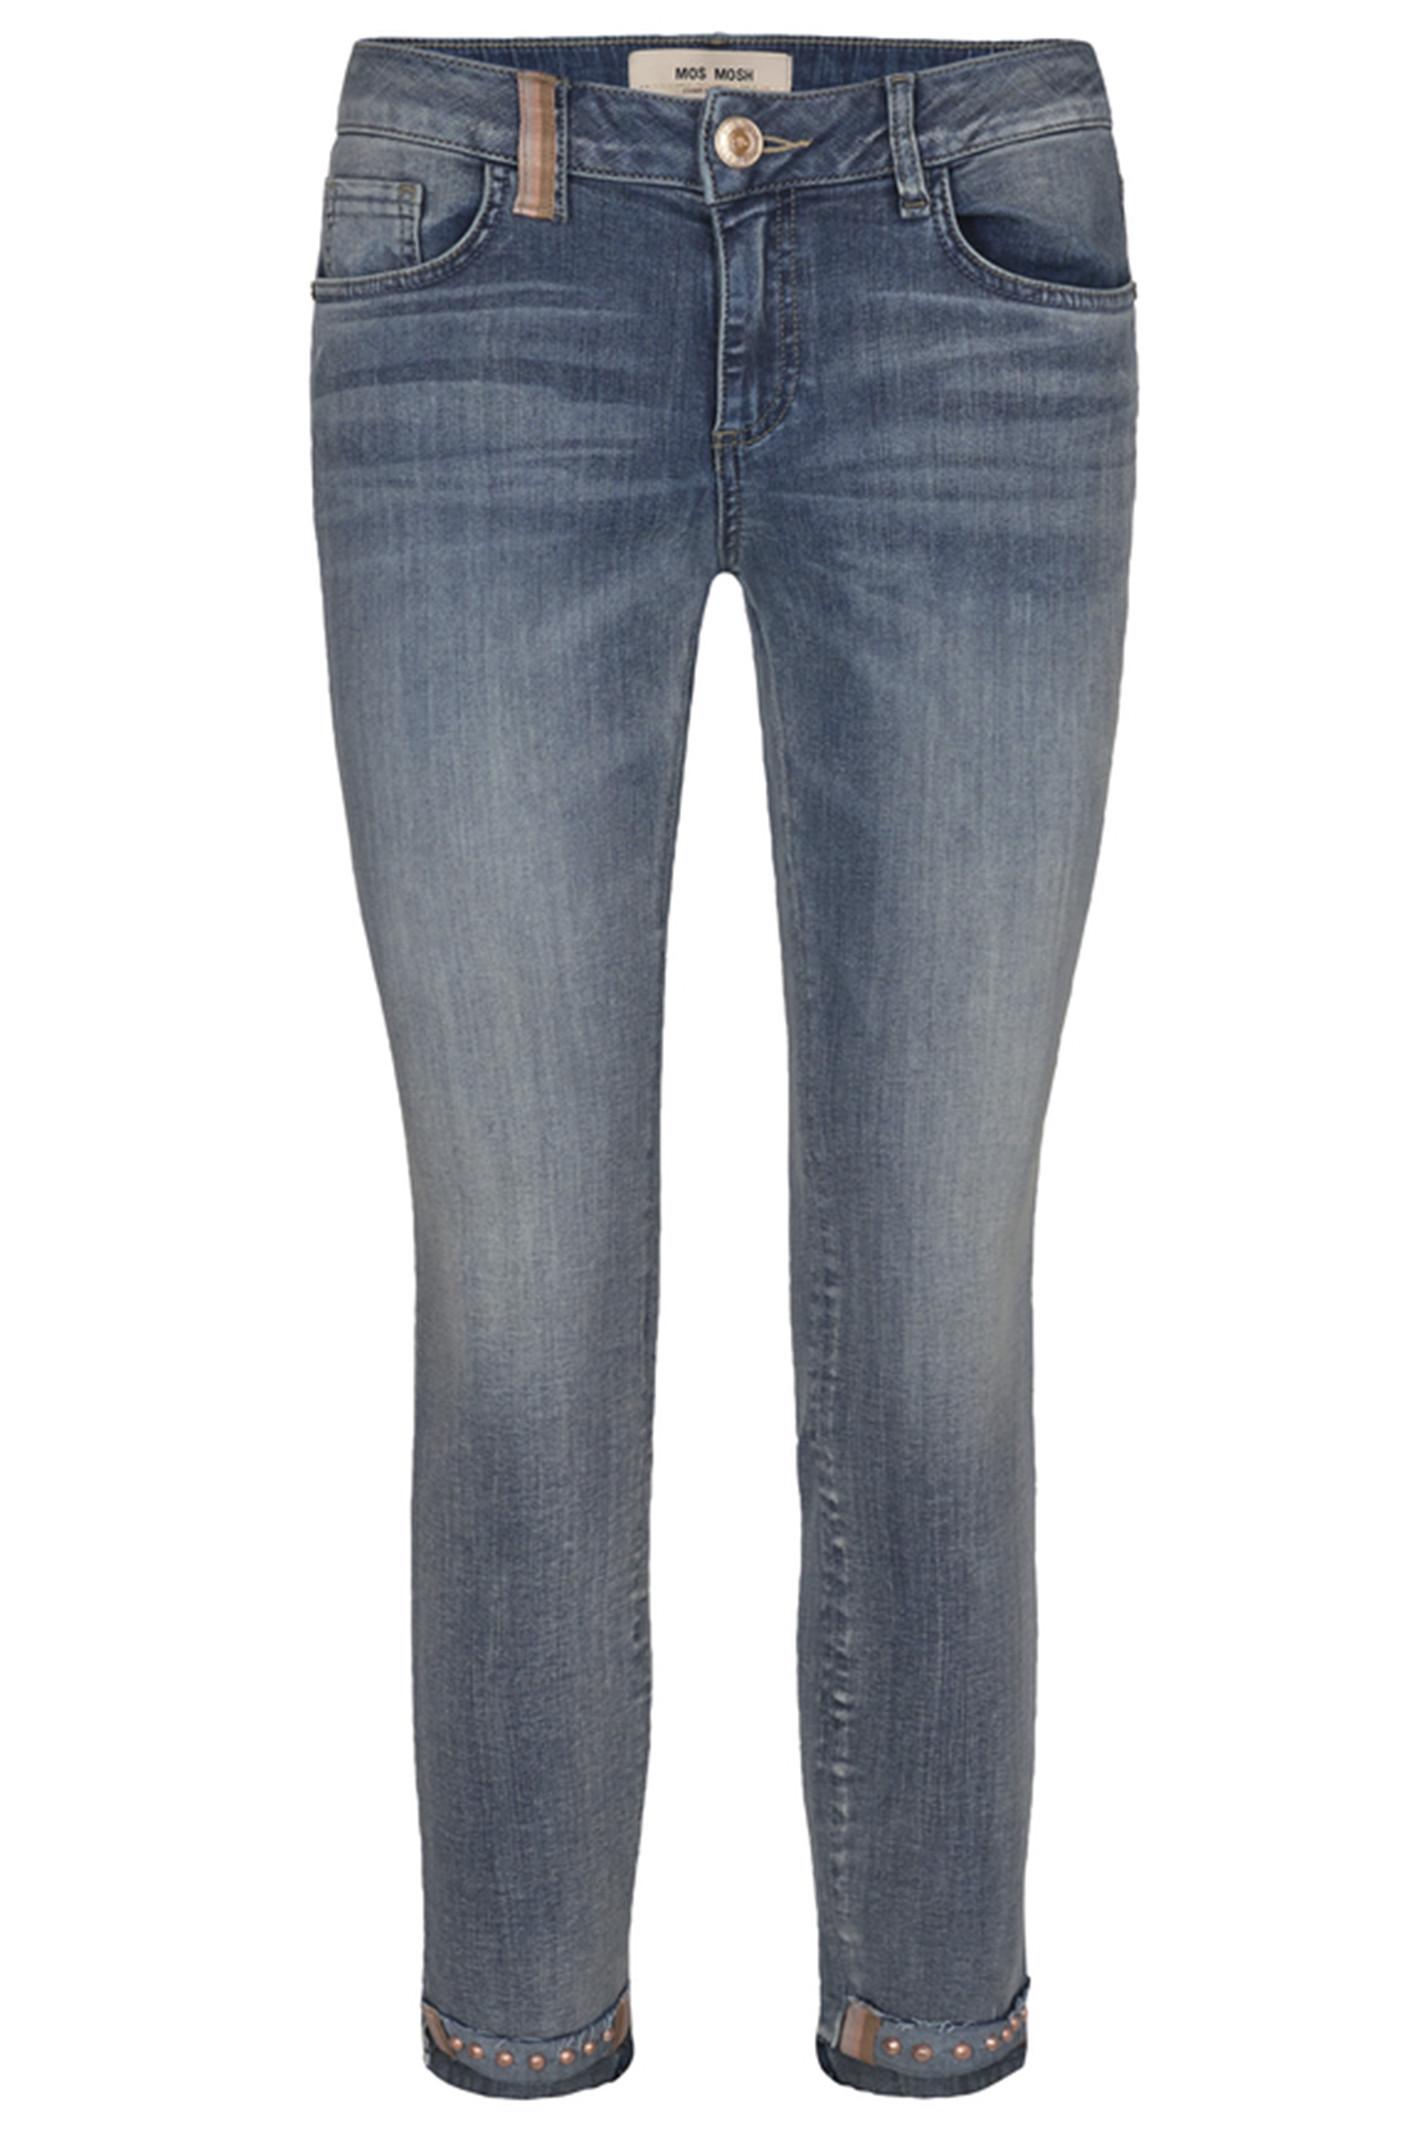 MOS MOSH Sumner Ida Troks Jeans 132440 Blue